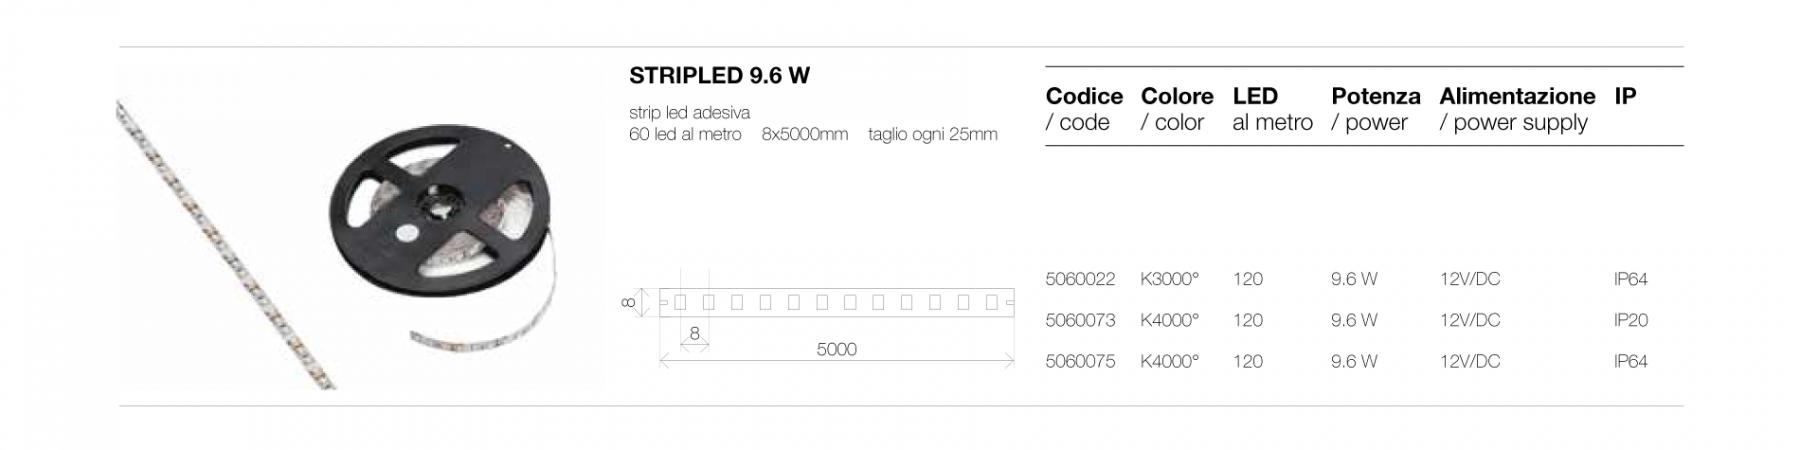 STRIP LED 9.6 W